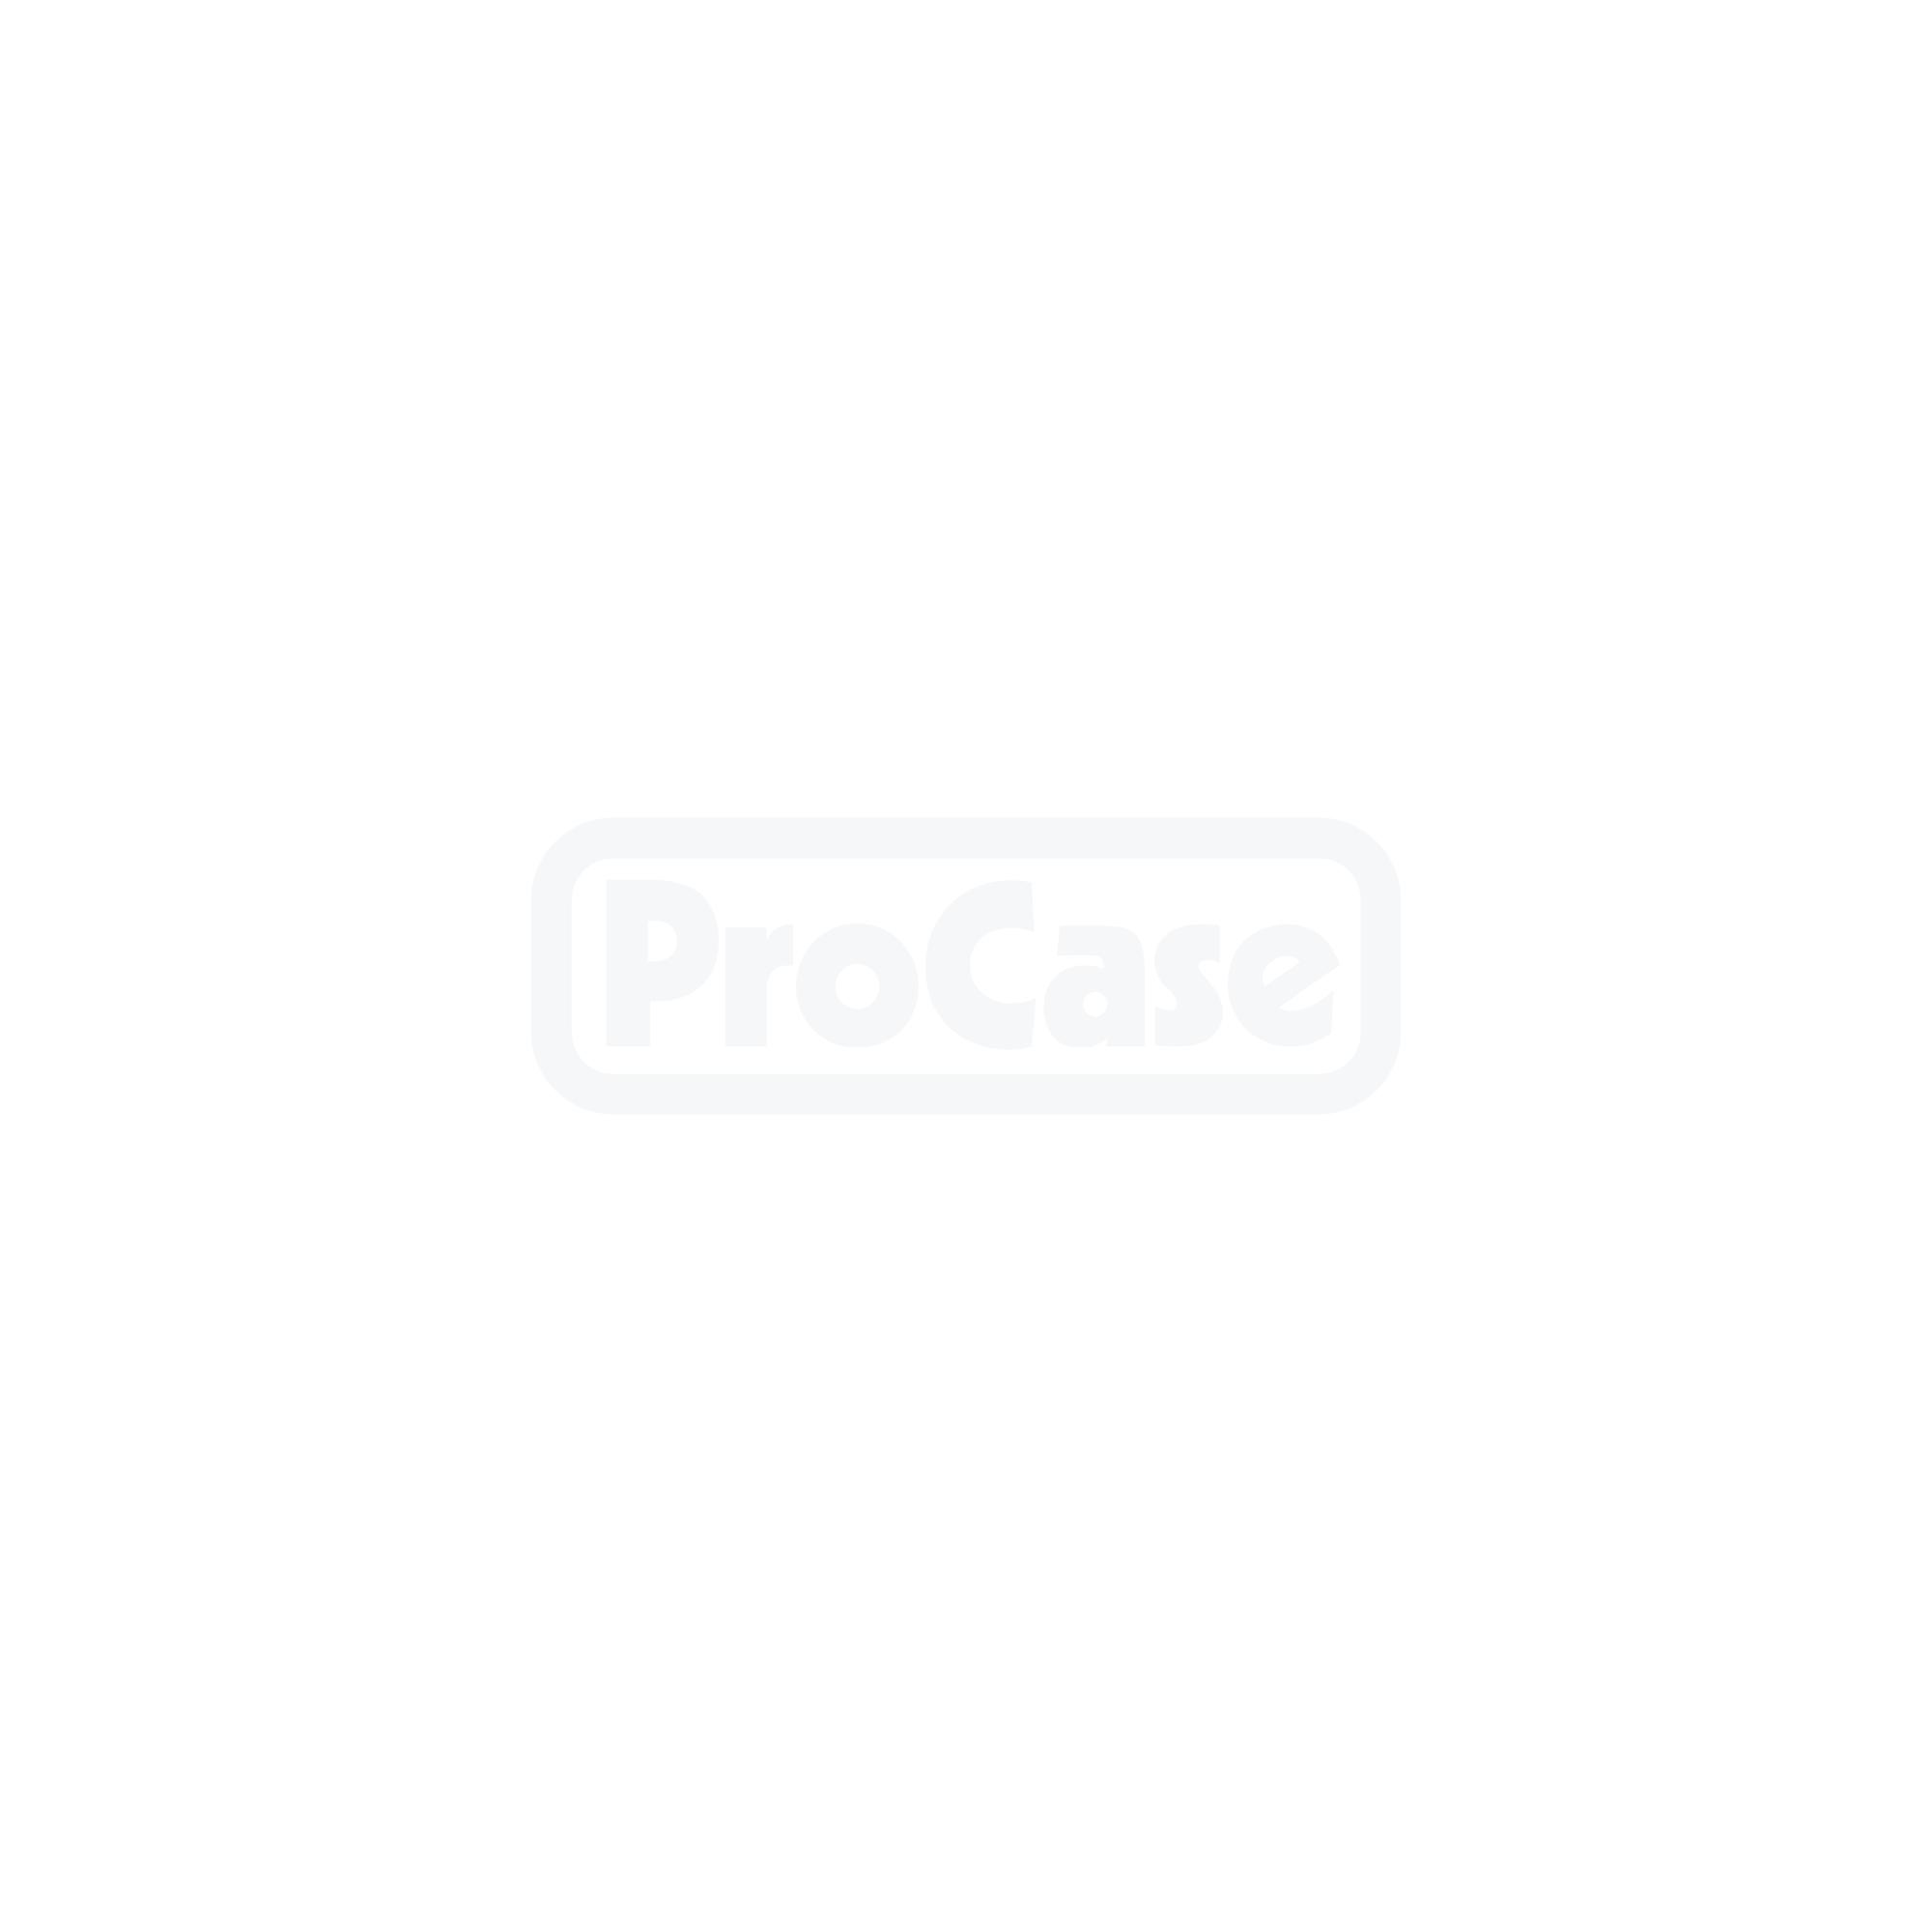 Flightcase für 2 d&b T Flugrahmen